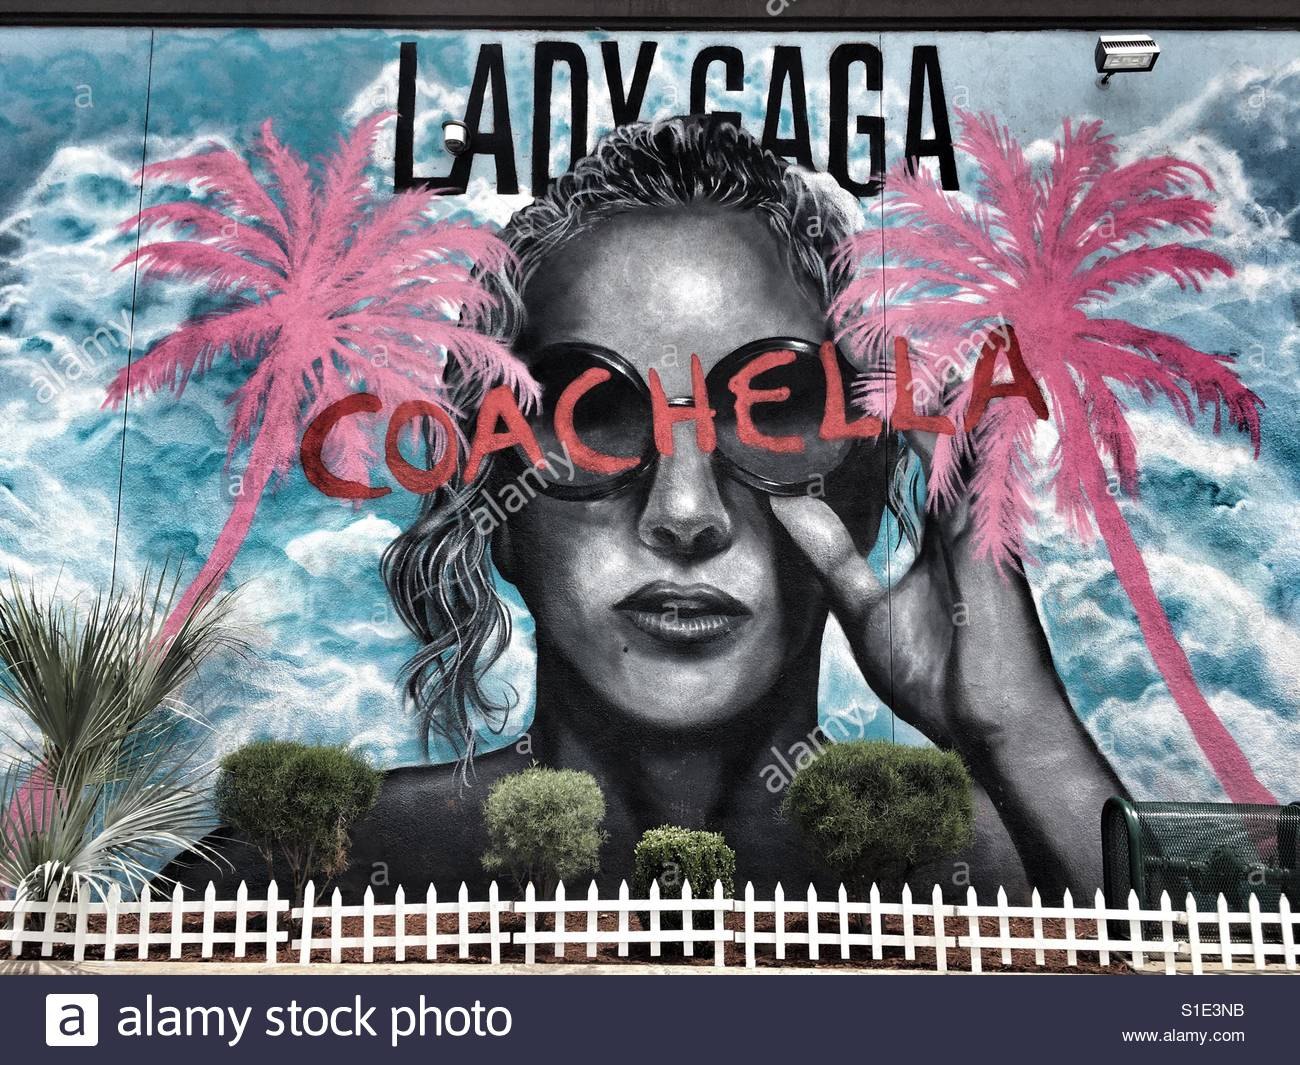 lady-gaga-mural-for-coachella-music-fest